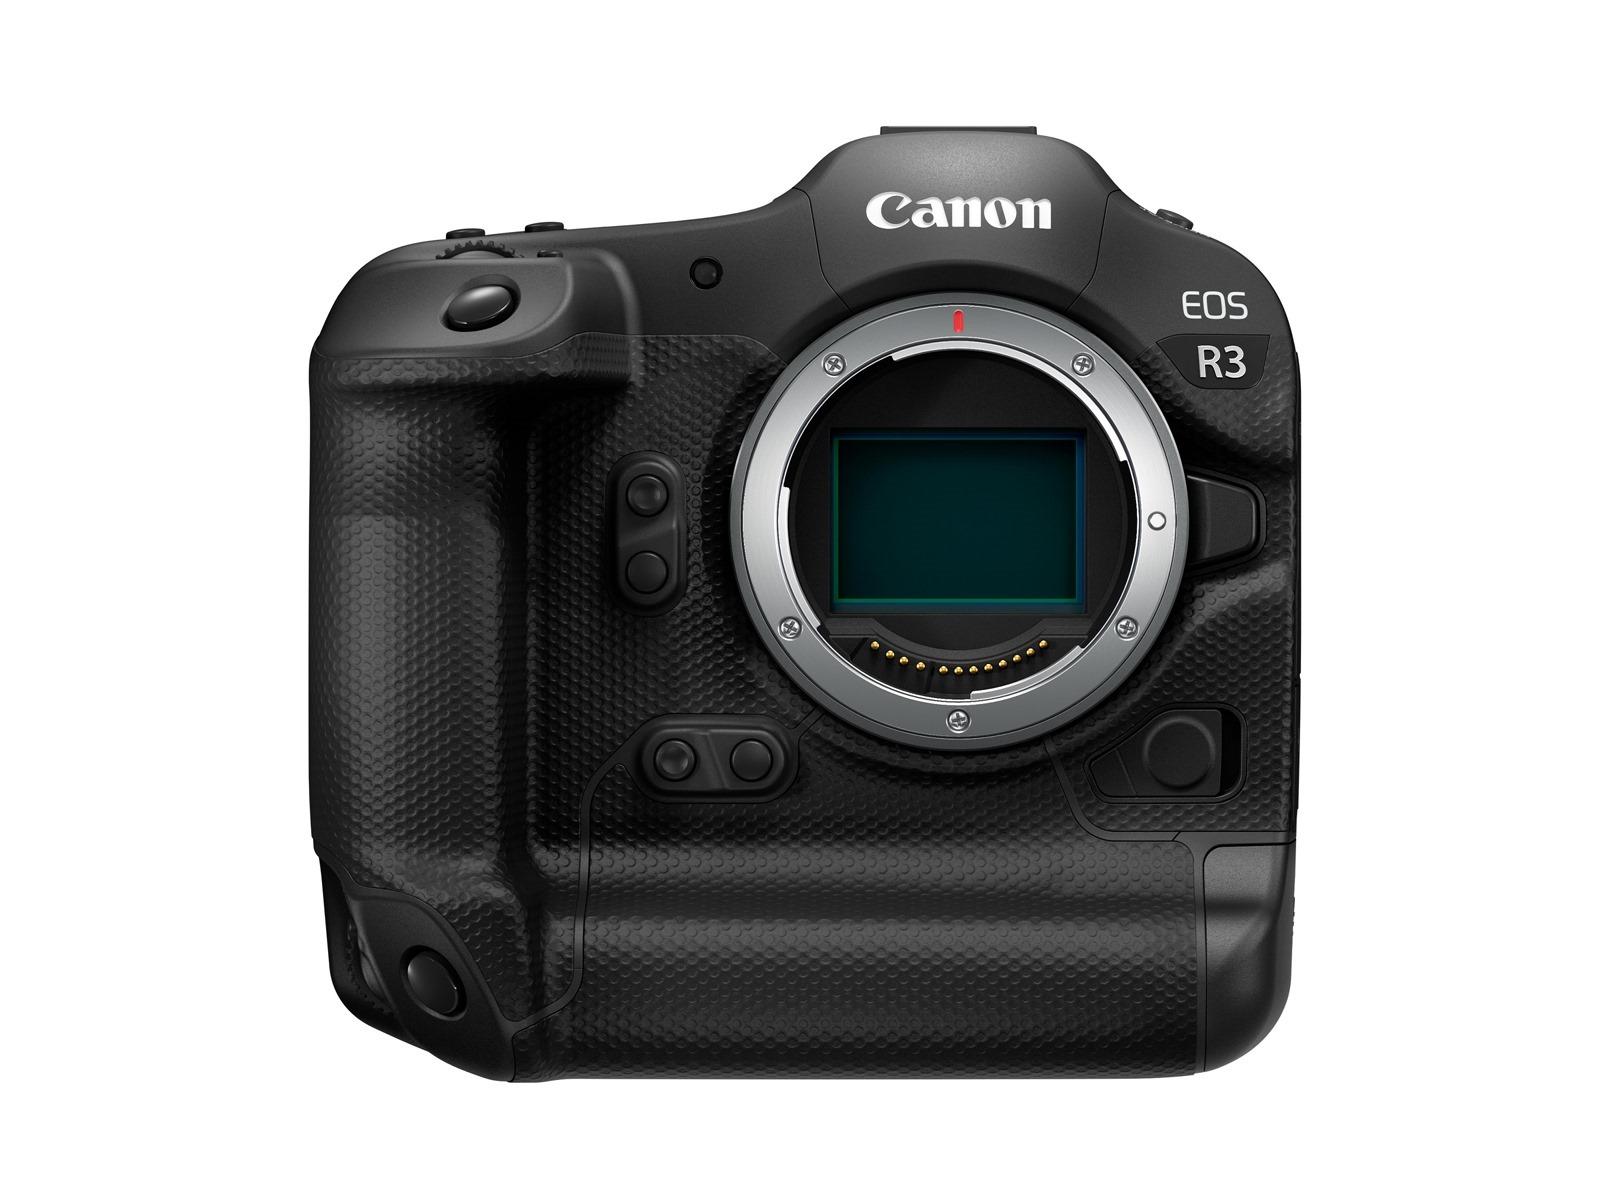 Canon 宣佈開發 EOS R3 全片幅無反光鏡相機 以高速、高感光及高可靠性擴展攝影可能性 @3C 達人廖阿輝